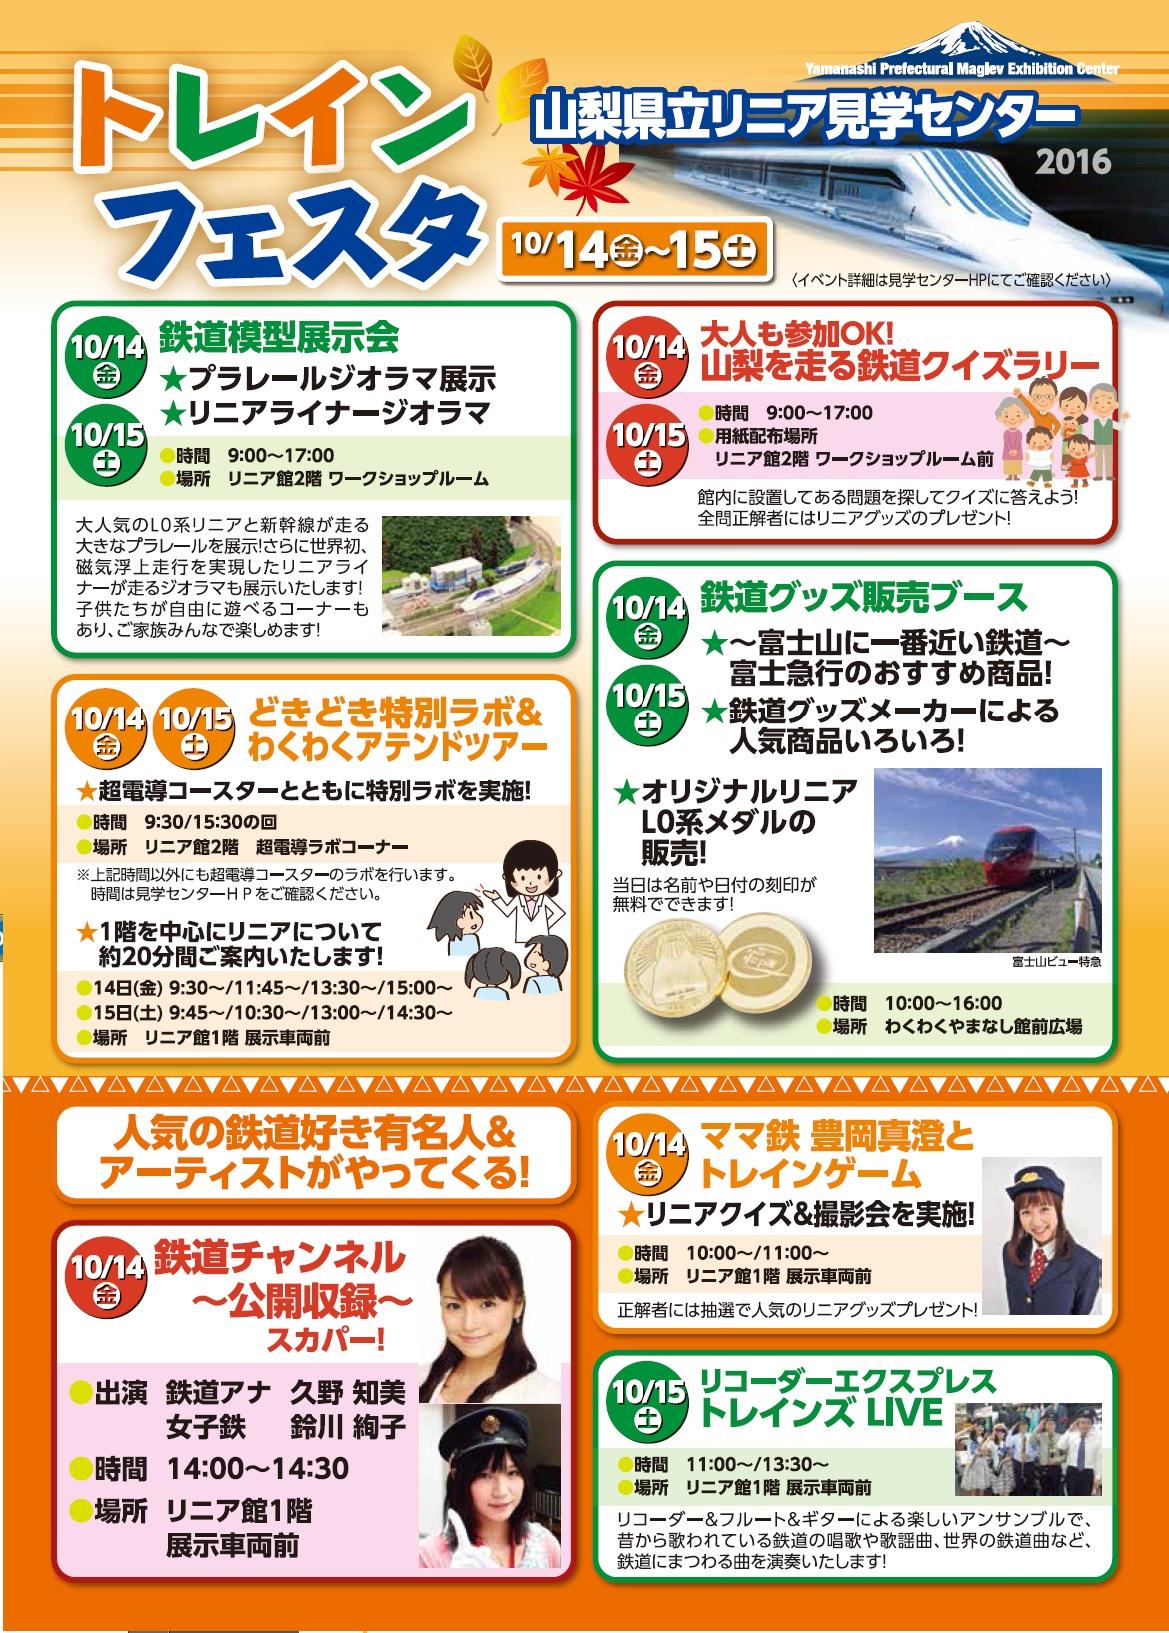 http://www.yamanashi-kankou.jp/blog/train_fes_2016.jpg